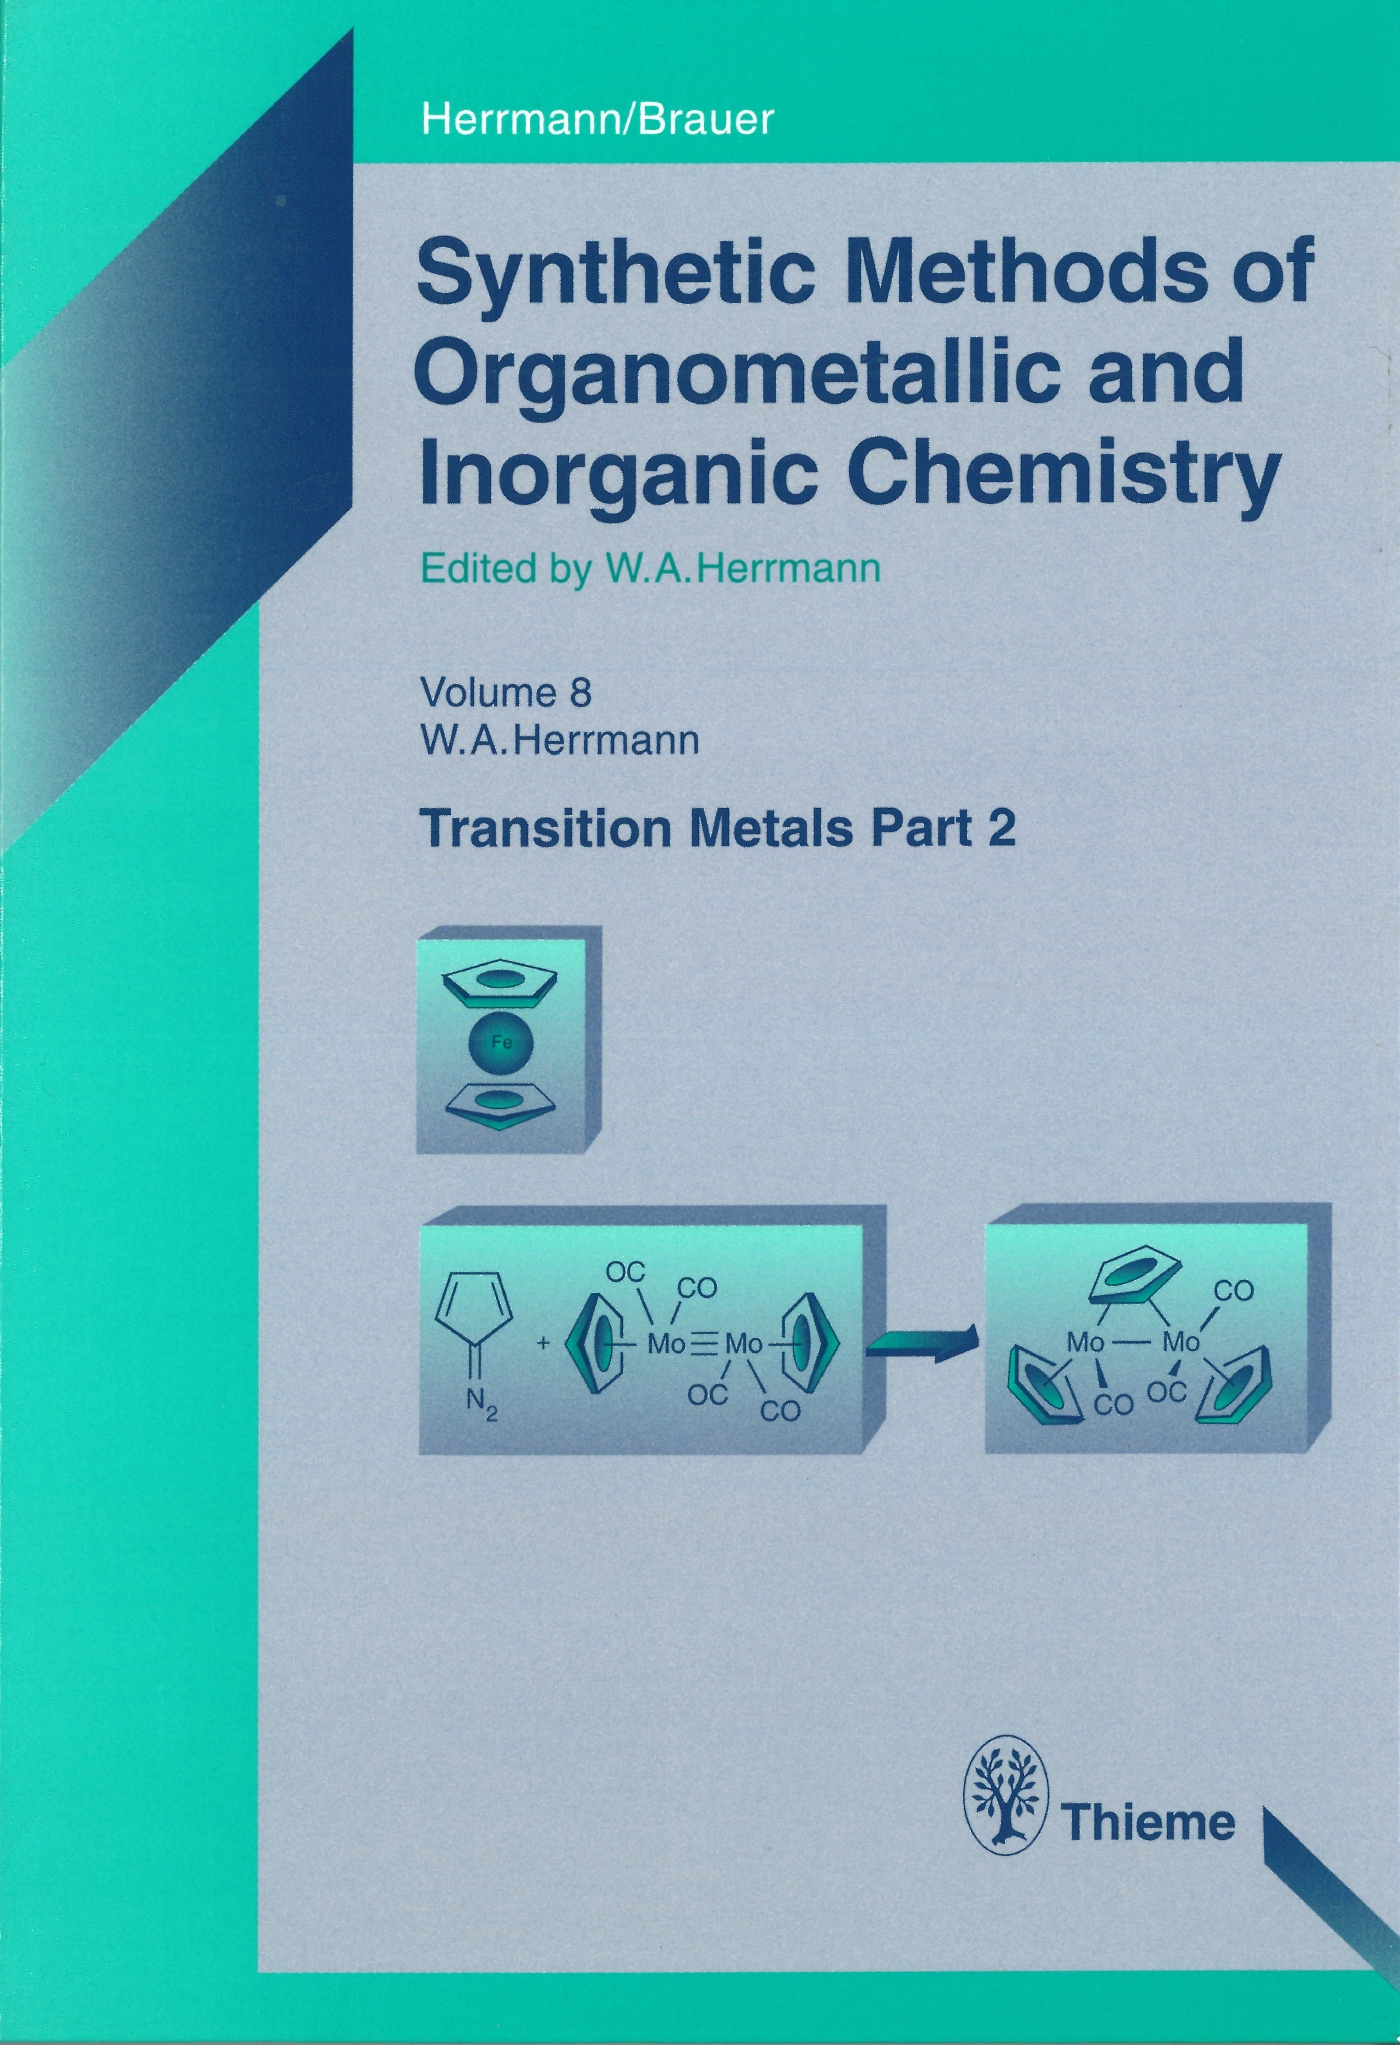 Synthetic Methods of Organometallic and Inorganic Chemistry, Volume 8, 1997